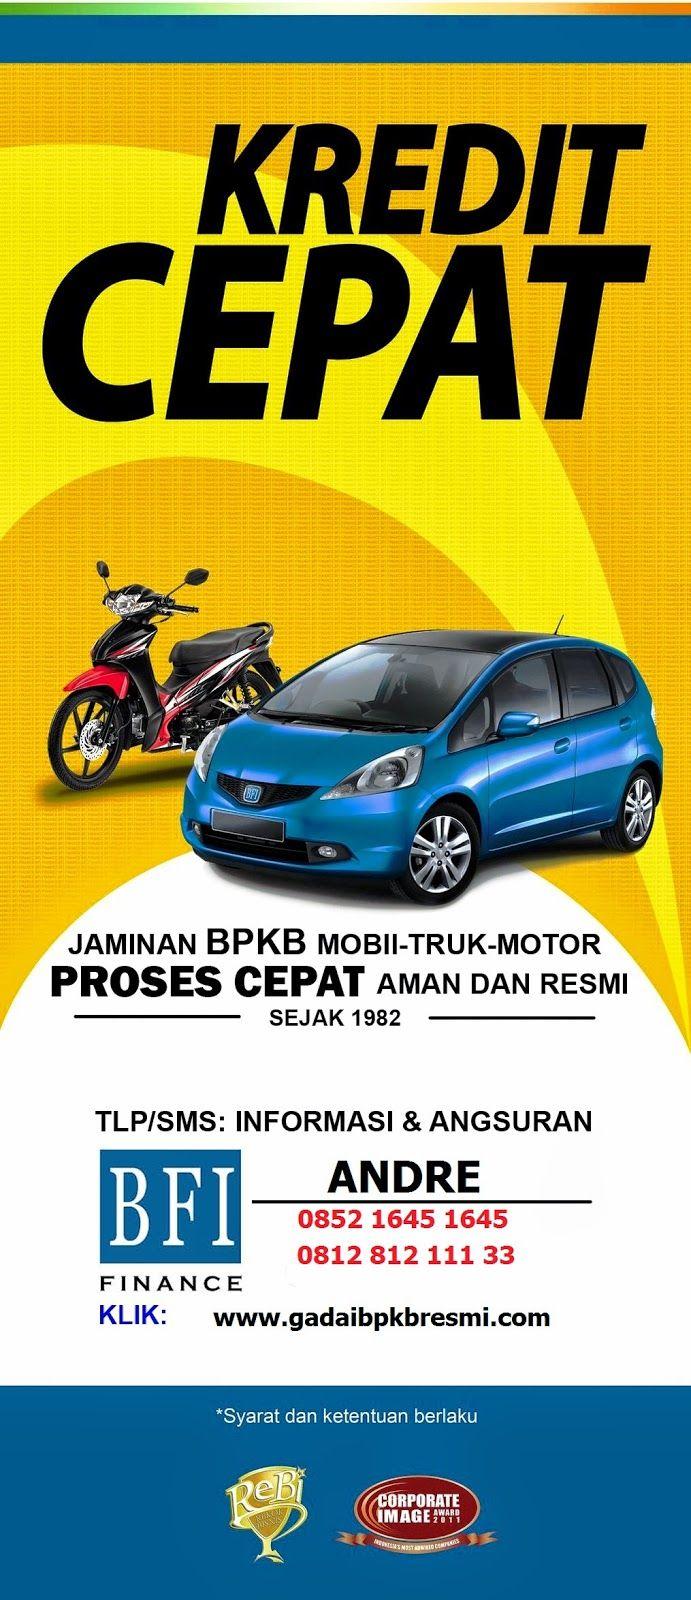 Gadai BPKB motor maupun mobil adalah salah satu produk ...